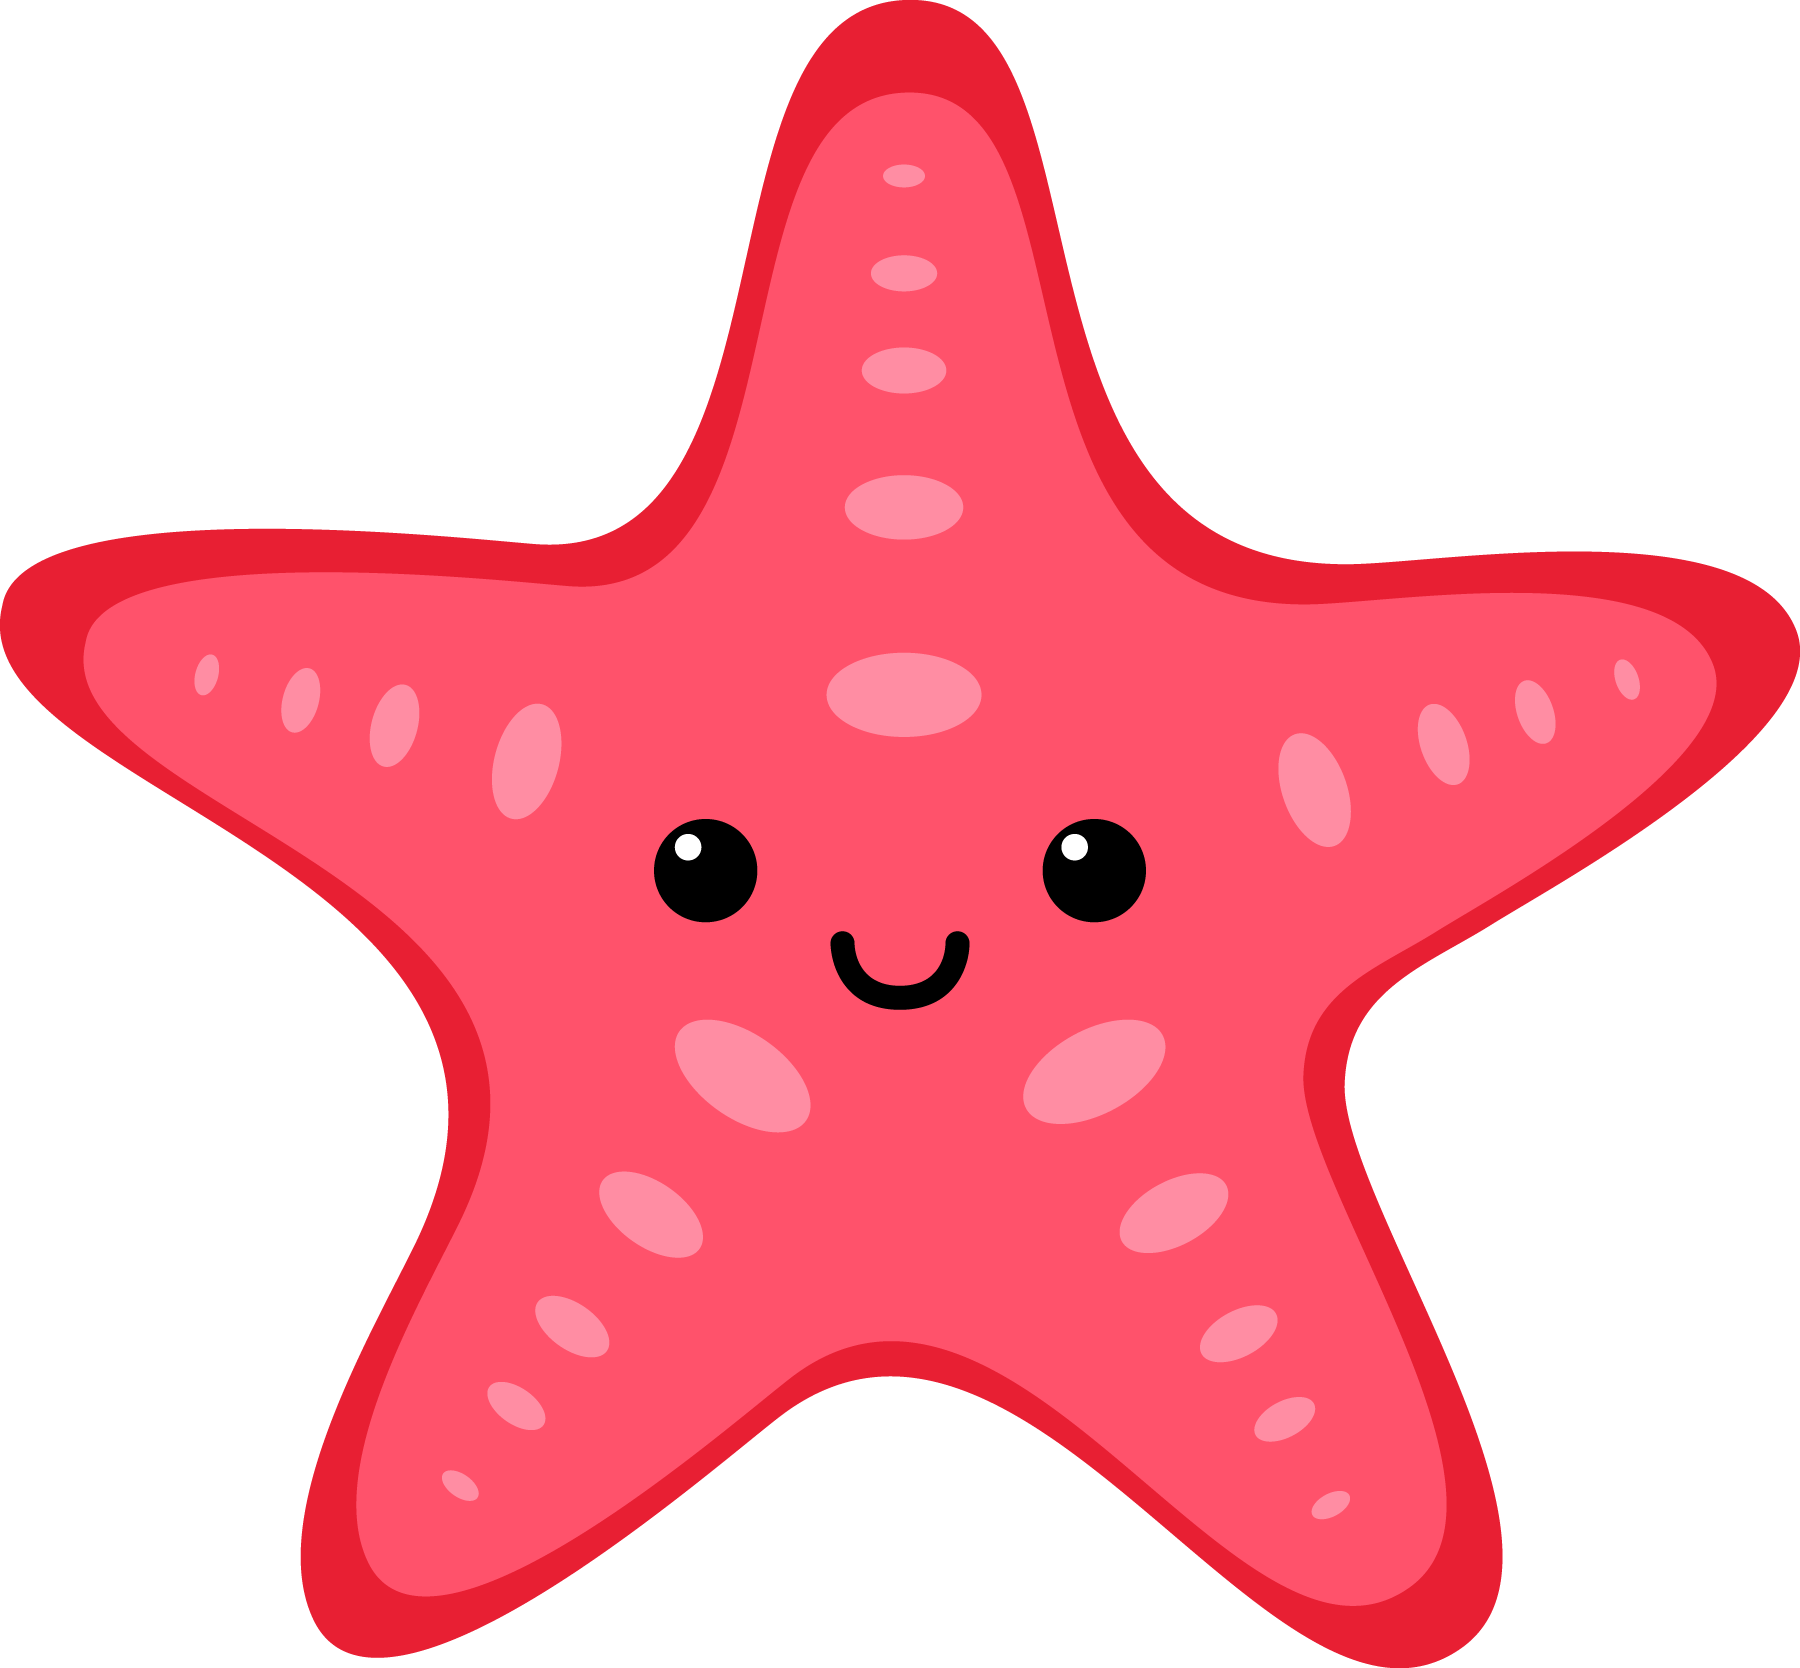 Cliparts Sea Creatures #2572919 - PNG Ocean Animals